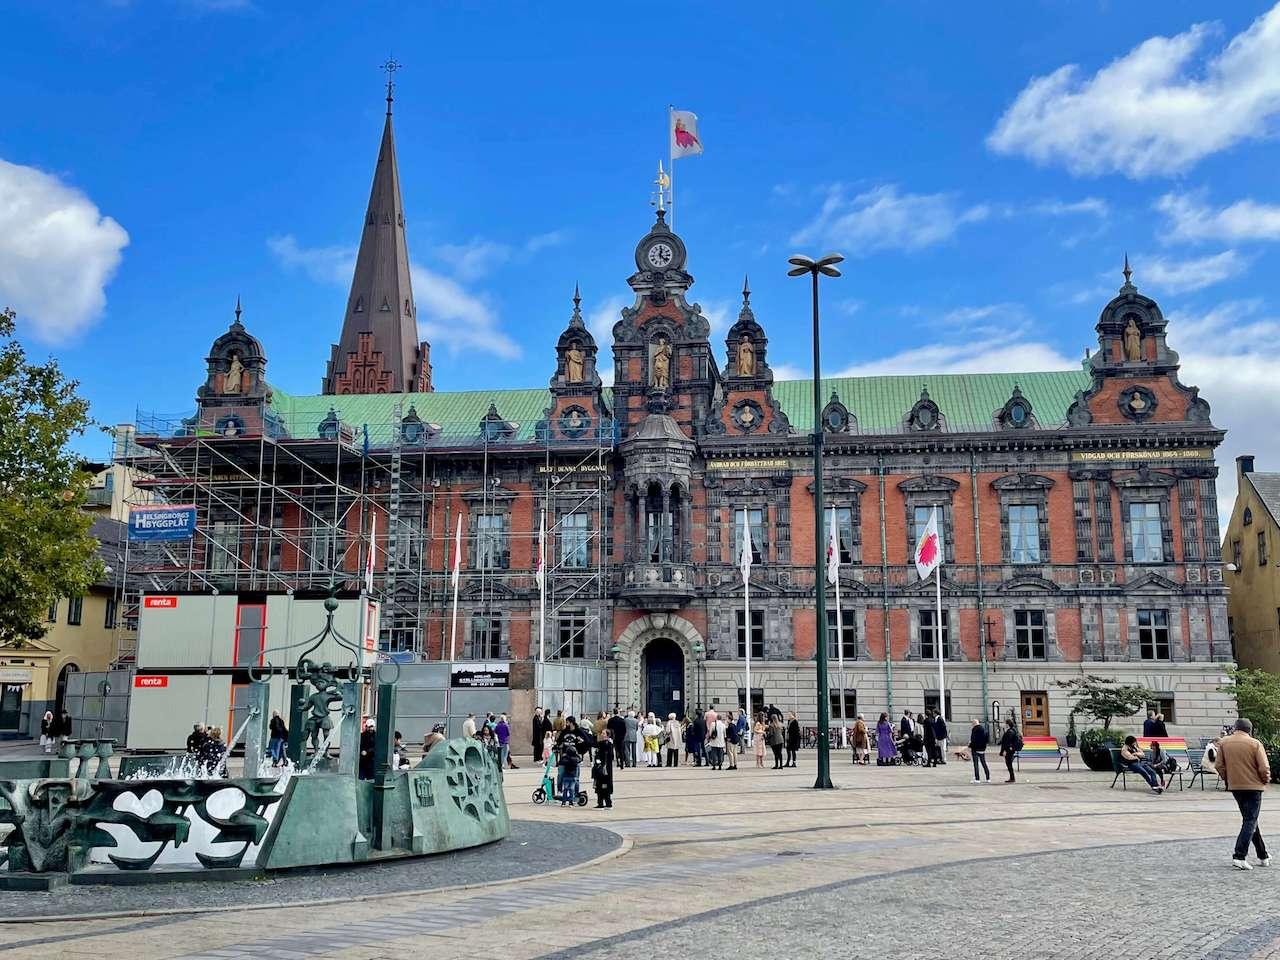 Sweden, Malmö - Historical district of Gamla Staden